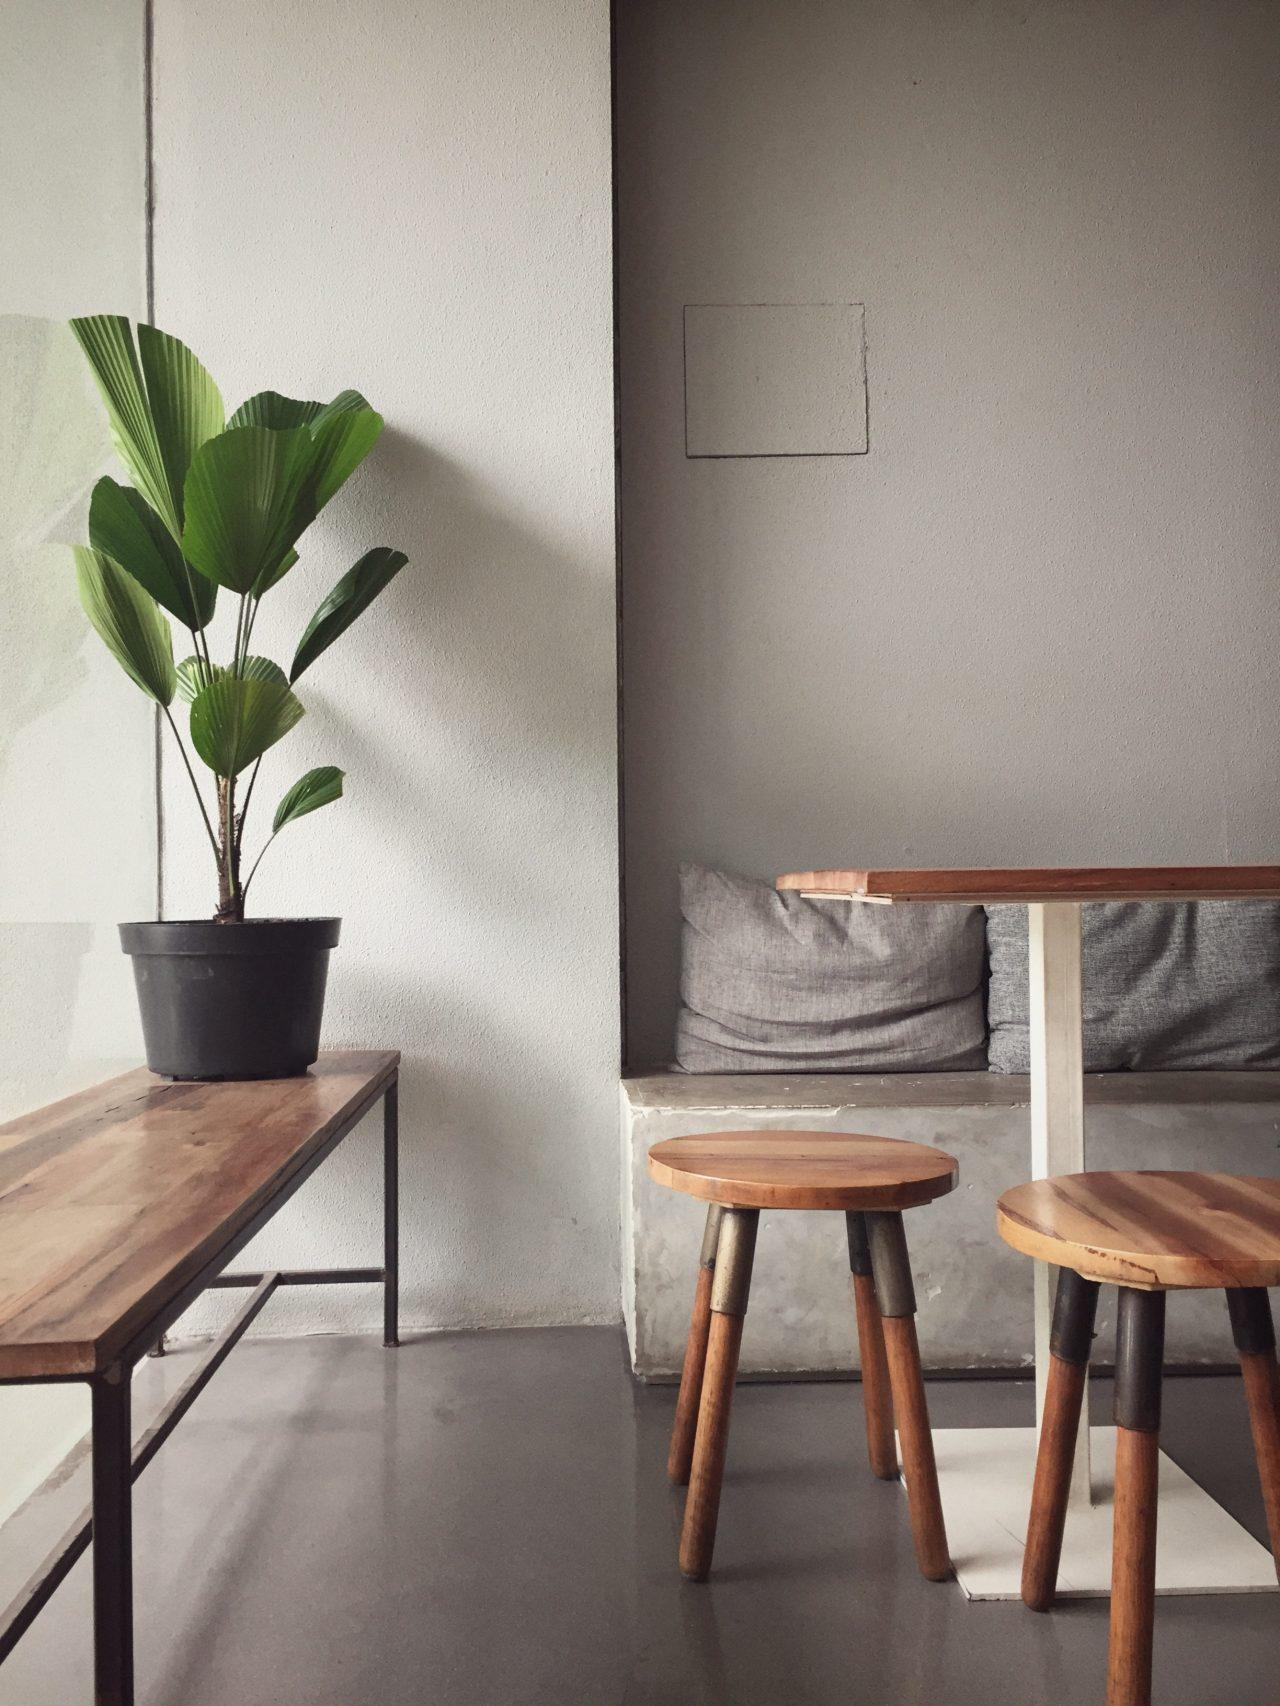 apartment-chairs-clean-3049121-2